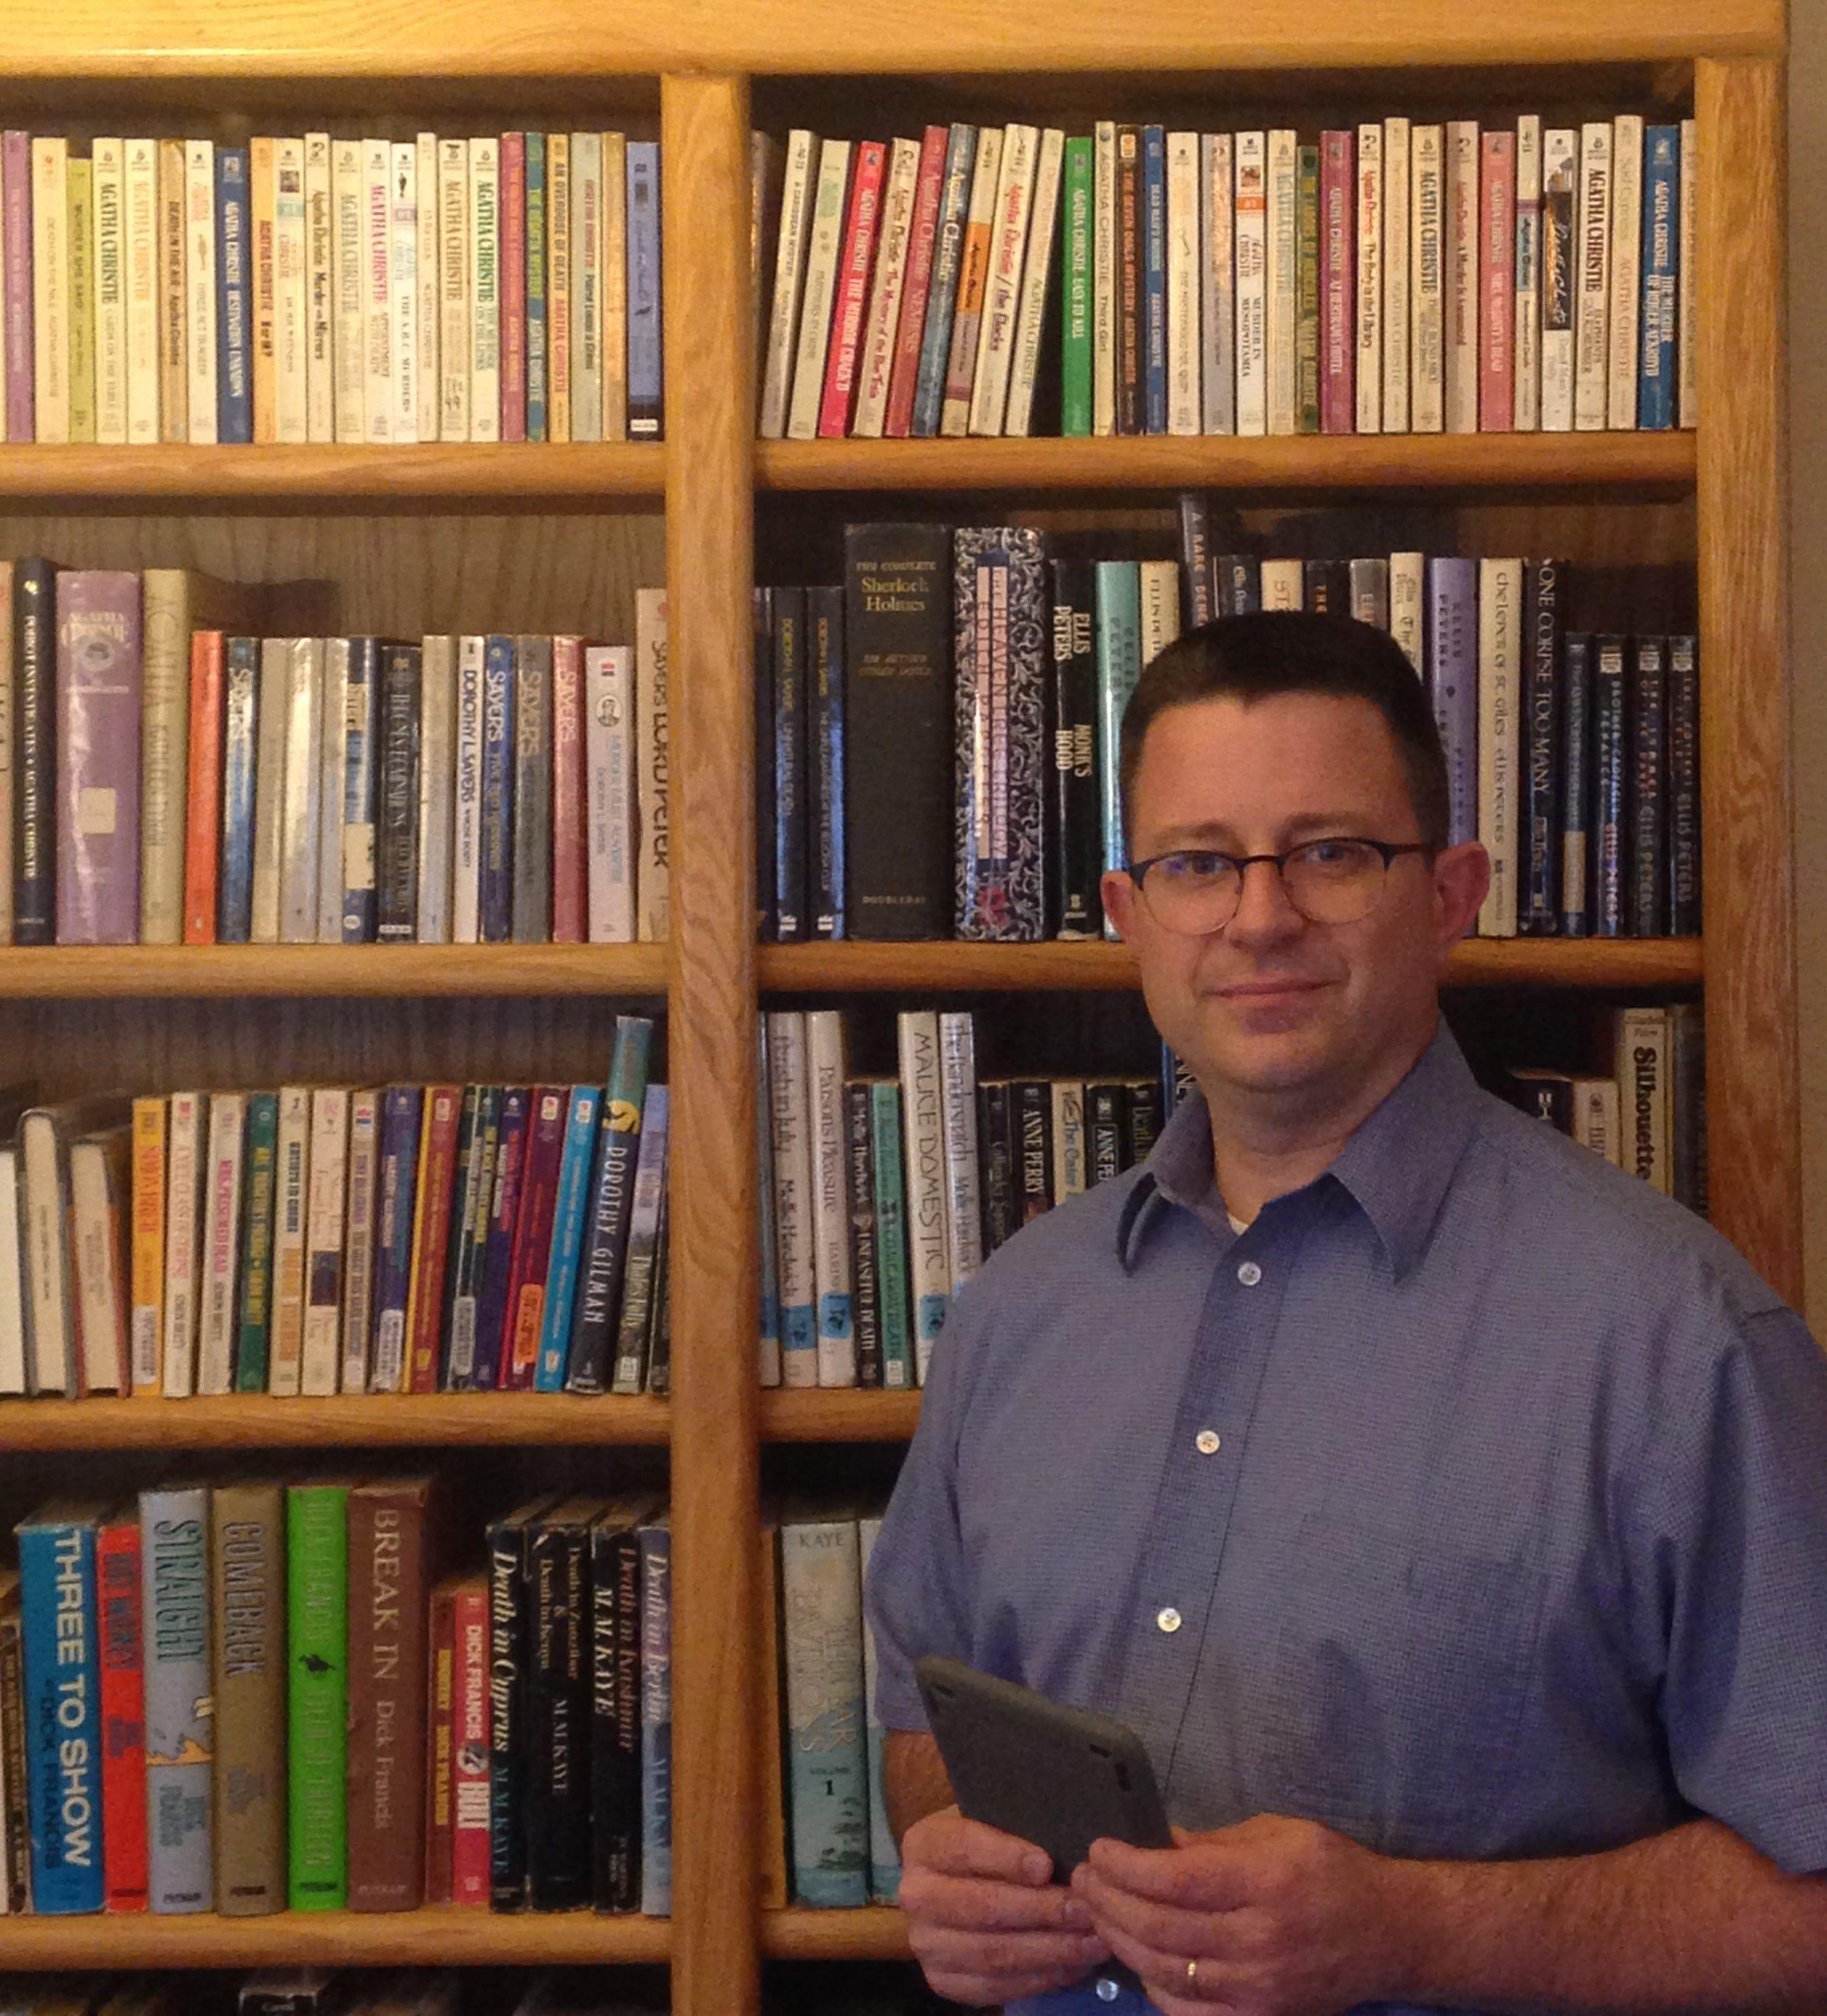 You should get to know Jeffrey Bruner